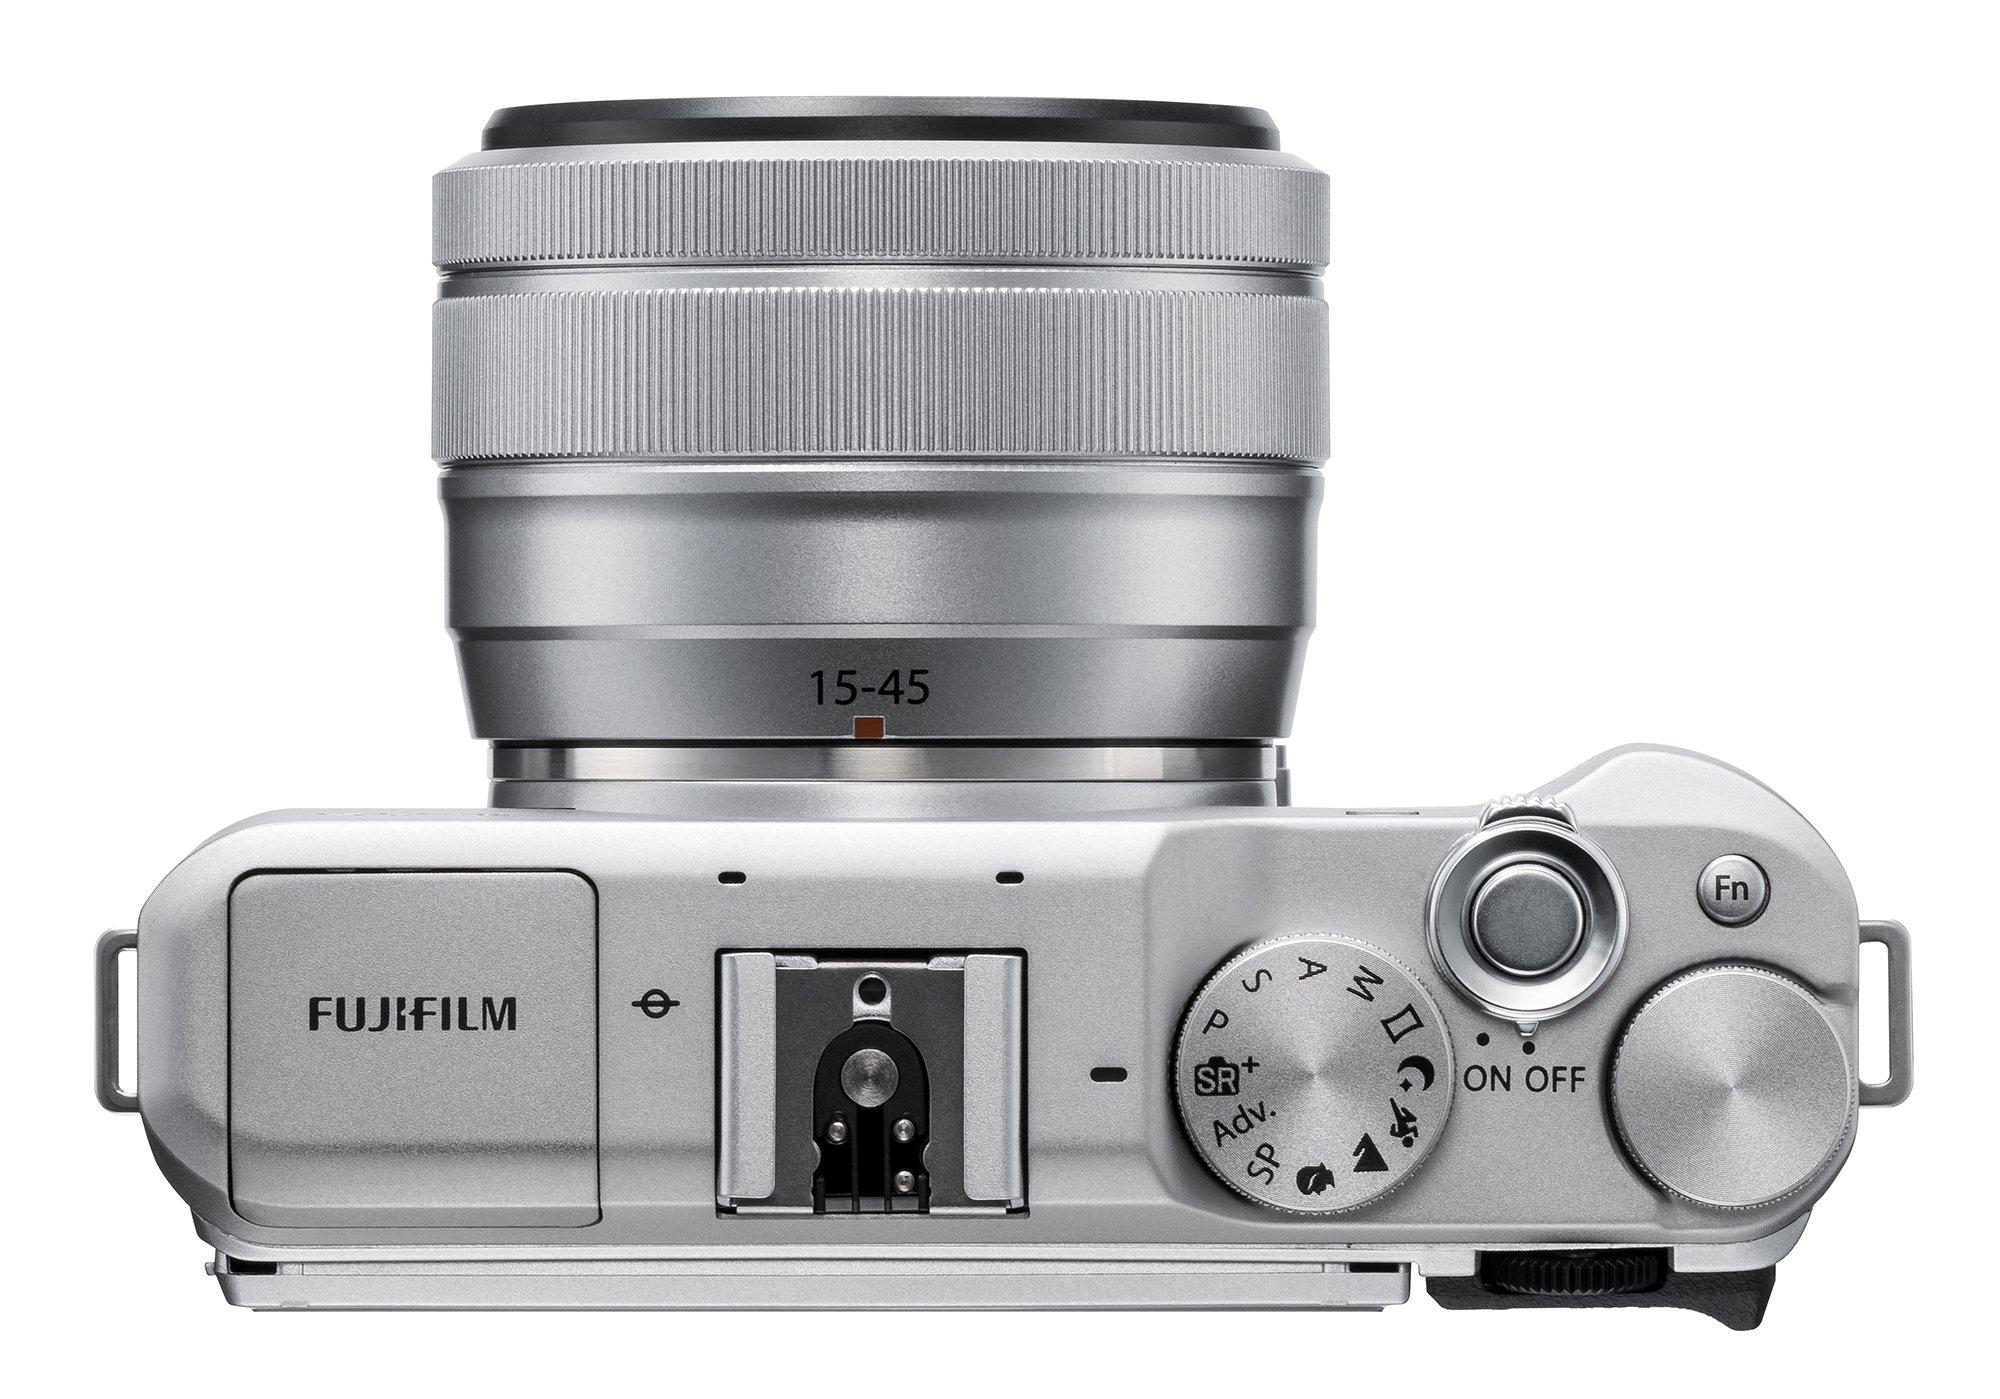 Fujifilm X-A5 Mirrorless Digital Camera w/XC15-45mmF3.5-5.6 OIS PZ Lens - Silver by Fujifilm (Image #6)